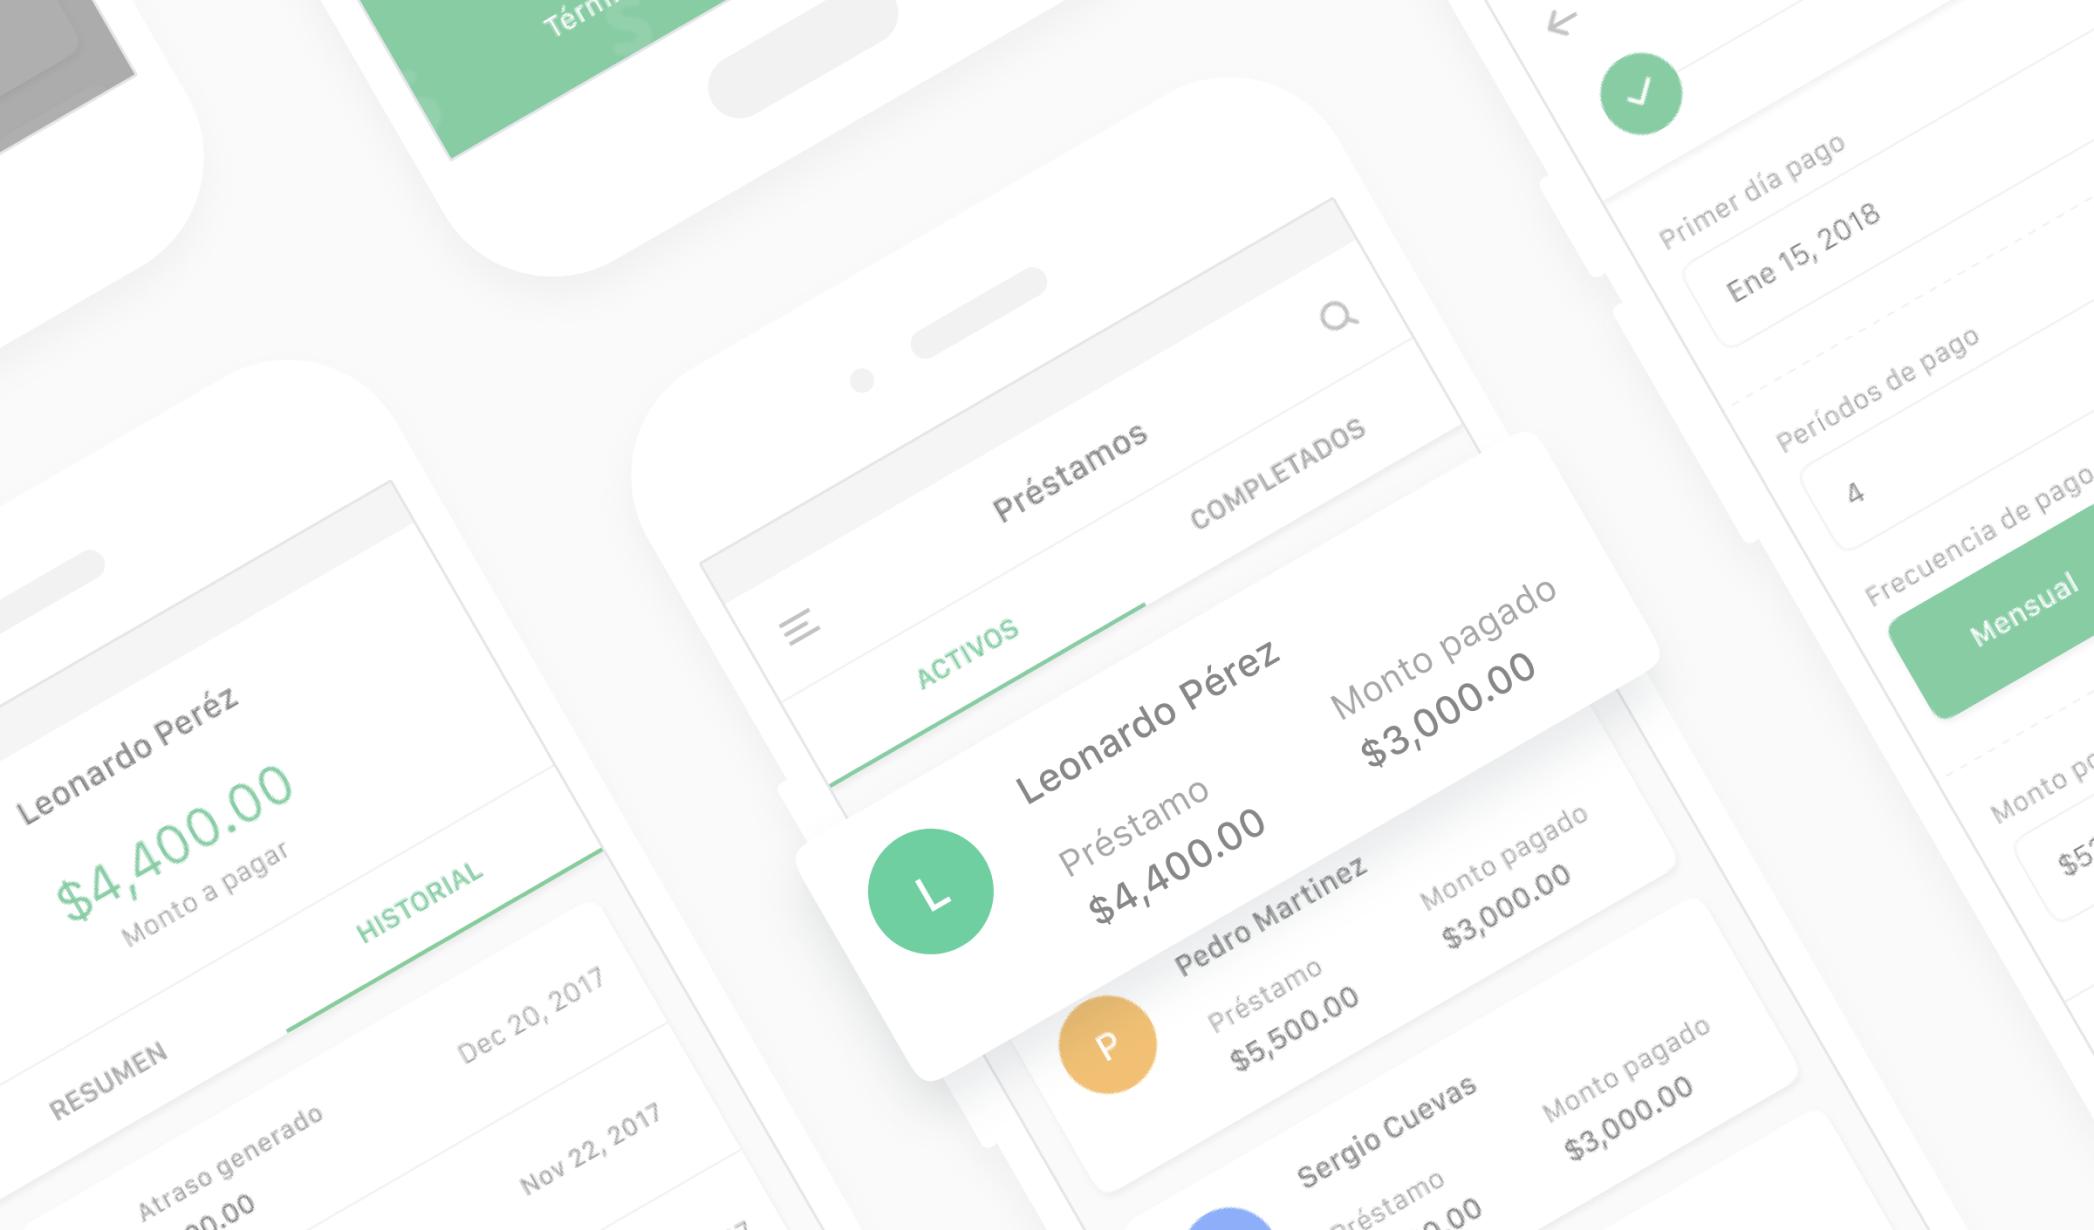 Logan App - Track Your Lending